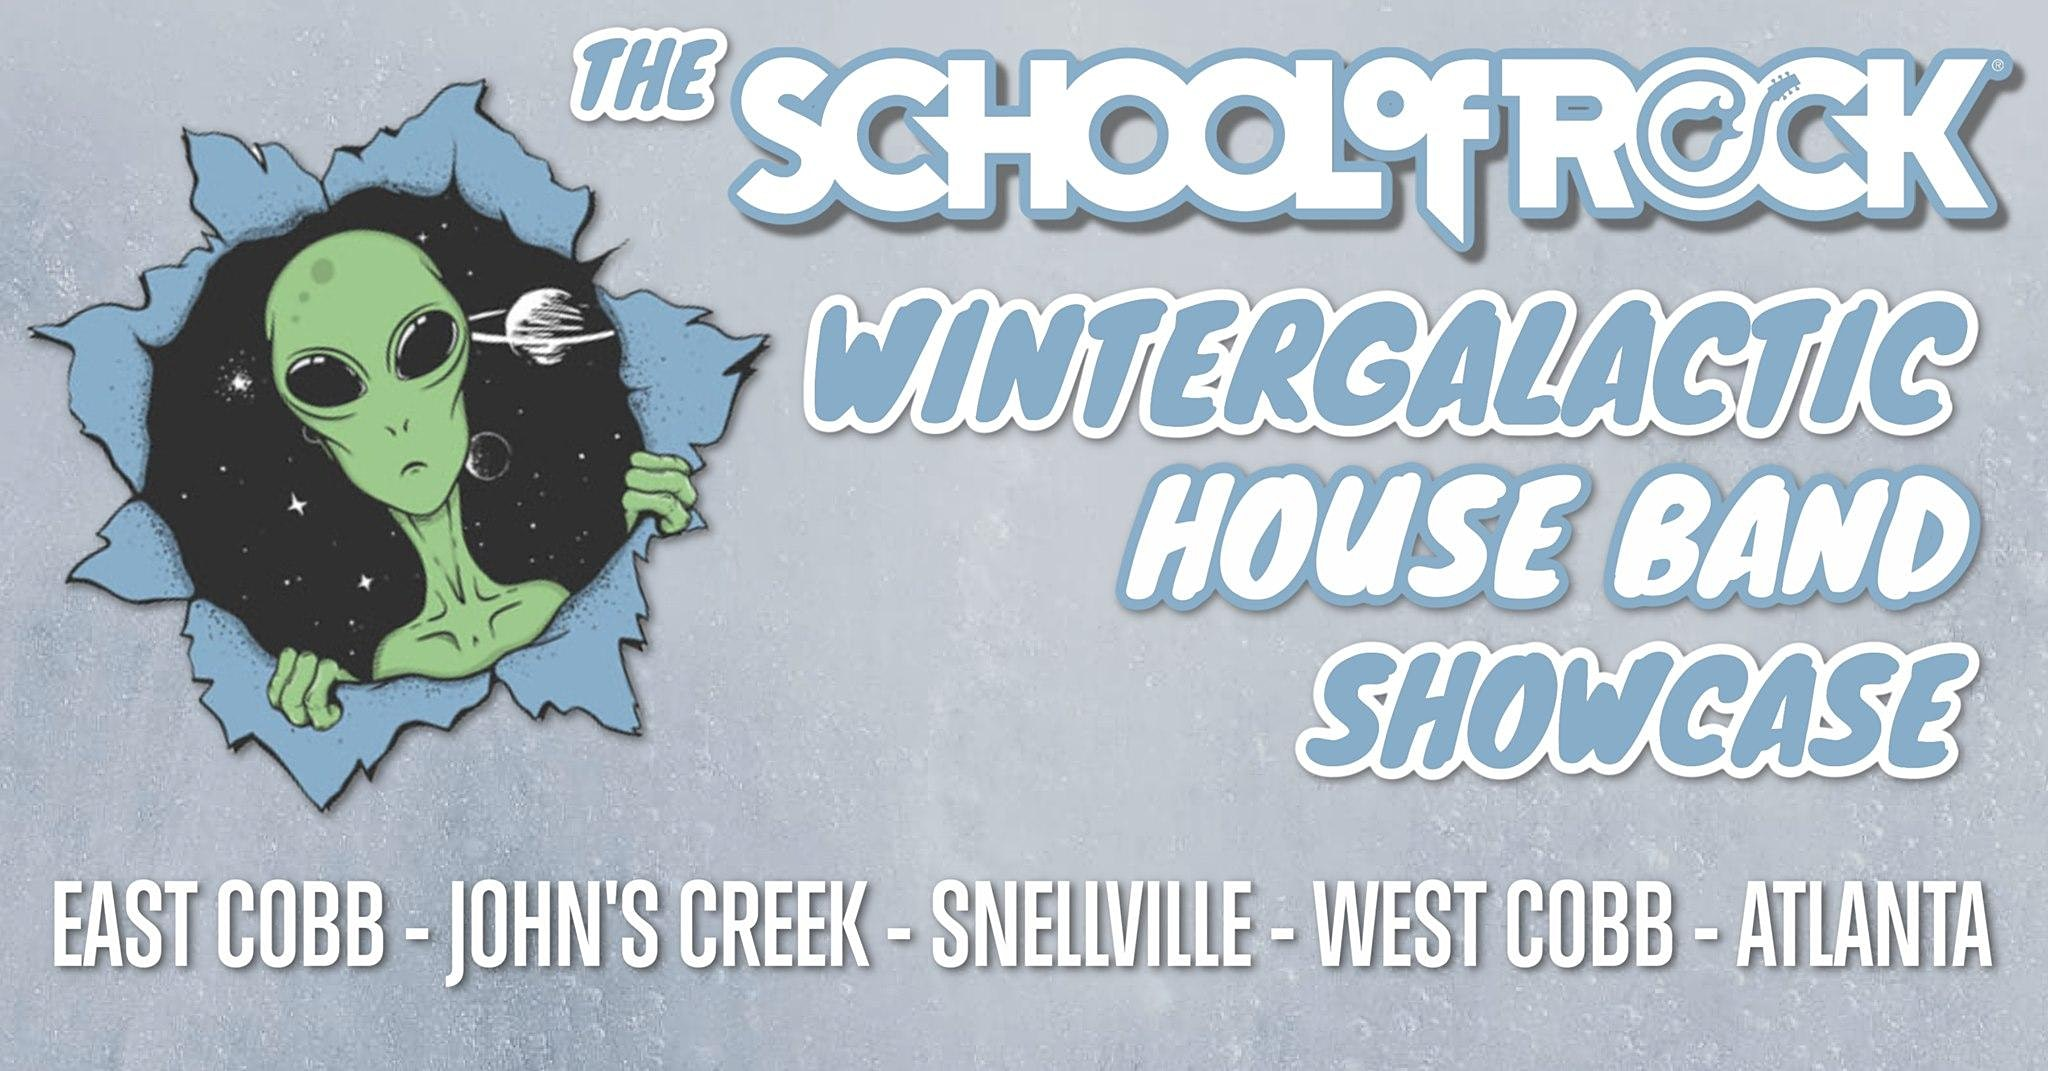 The School of Rock Wintergalactic House Band Showcase